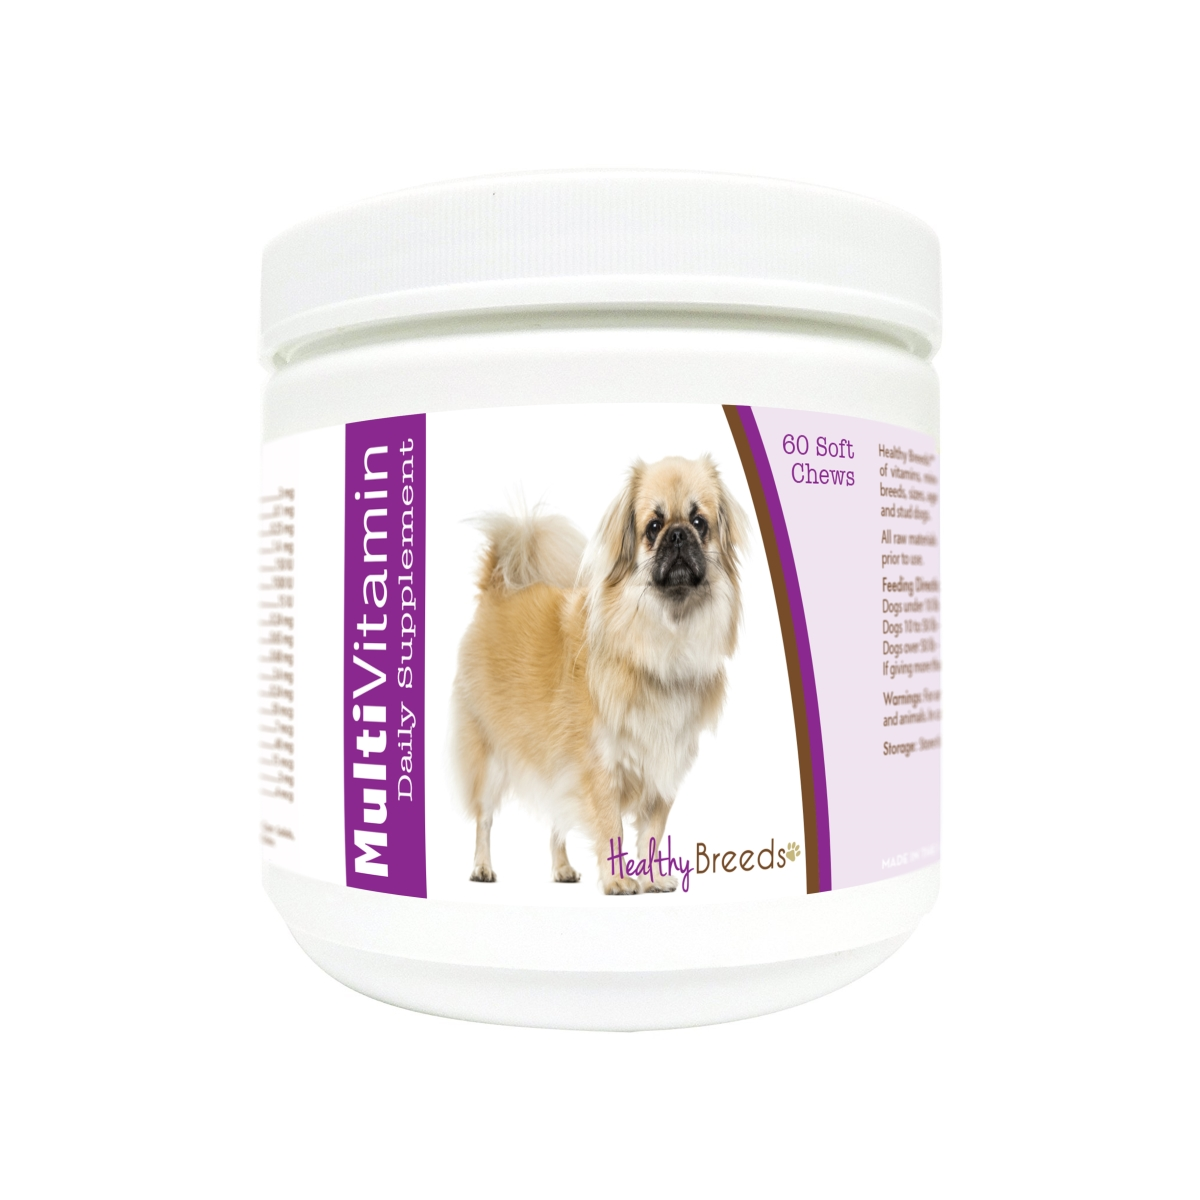 Healthy Breeds 840235172550 Tibetan Spaniel Multi-Vitamin Soft Chews - 60 Count